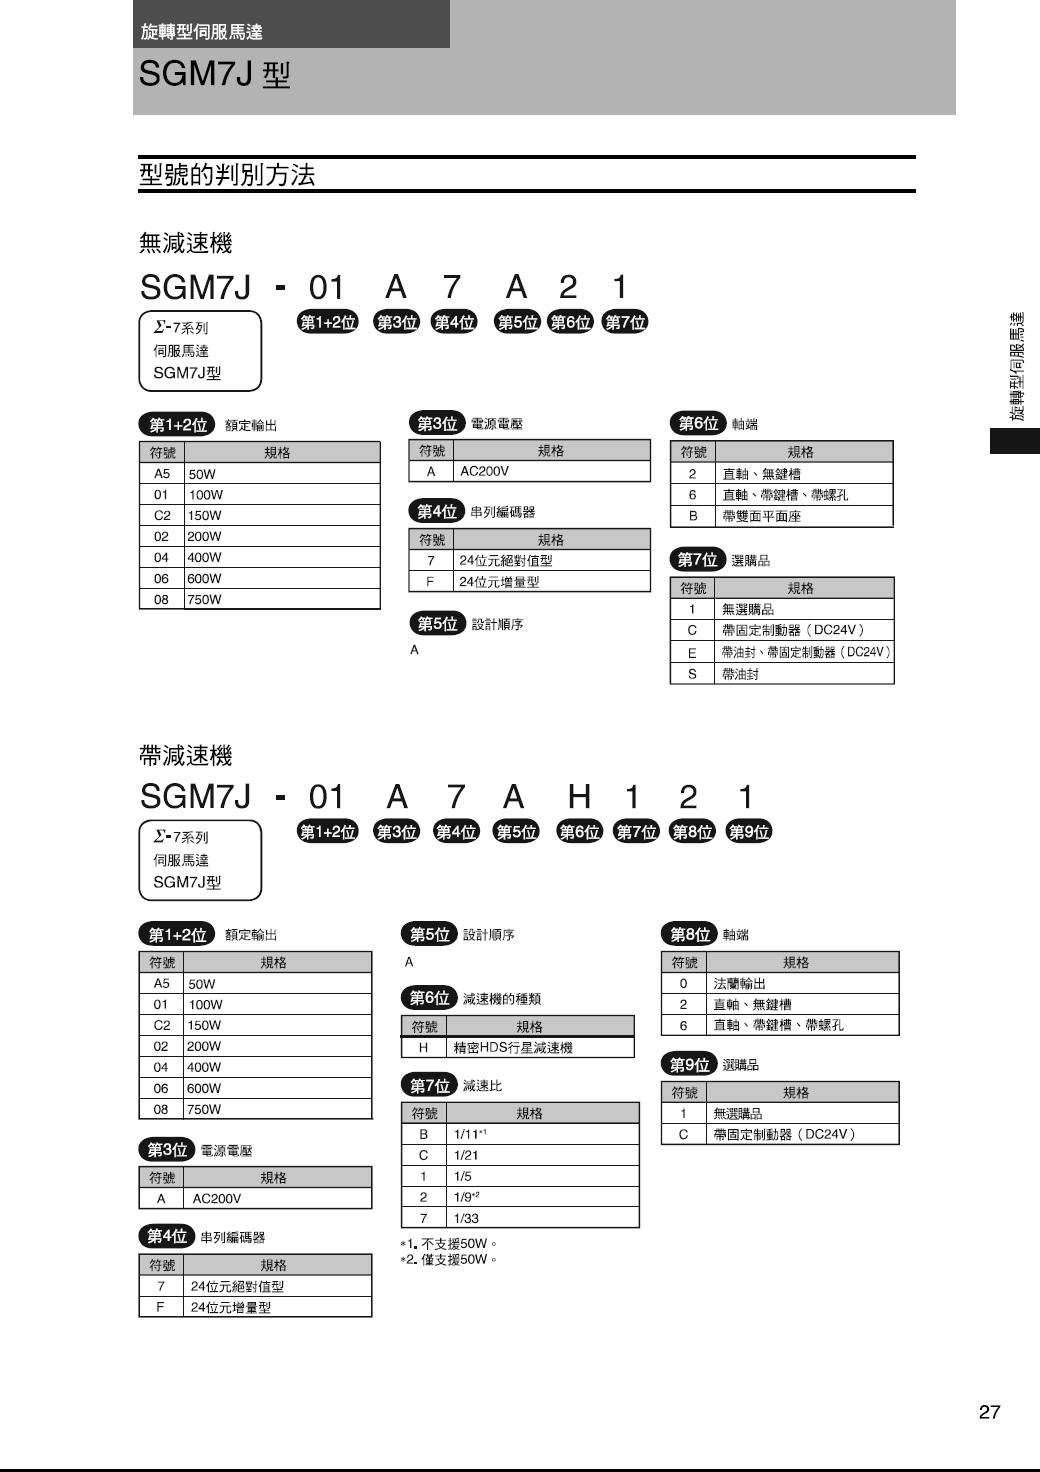 SGM7J_規格.jpg